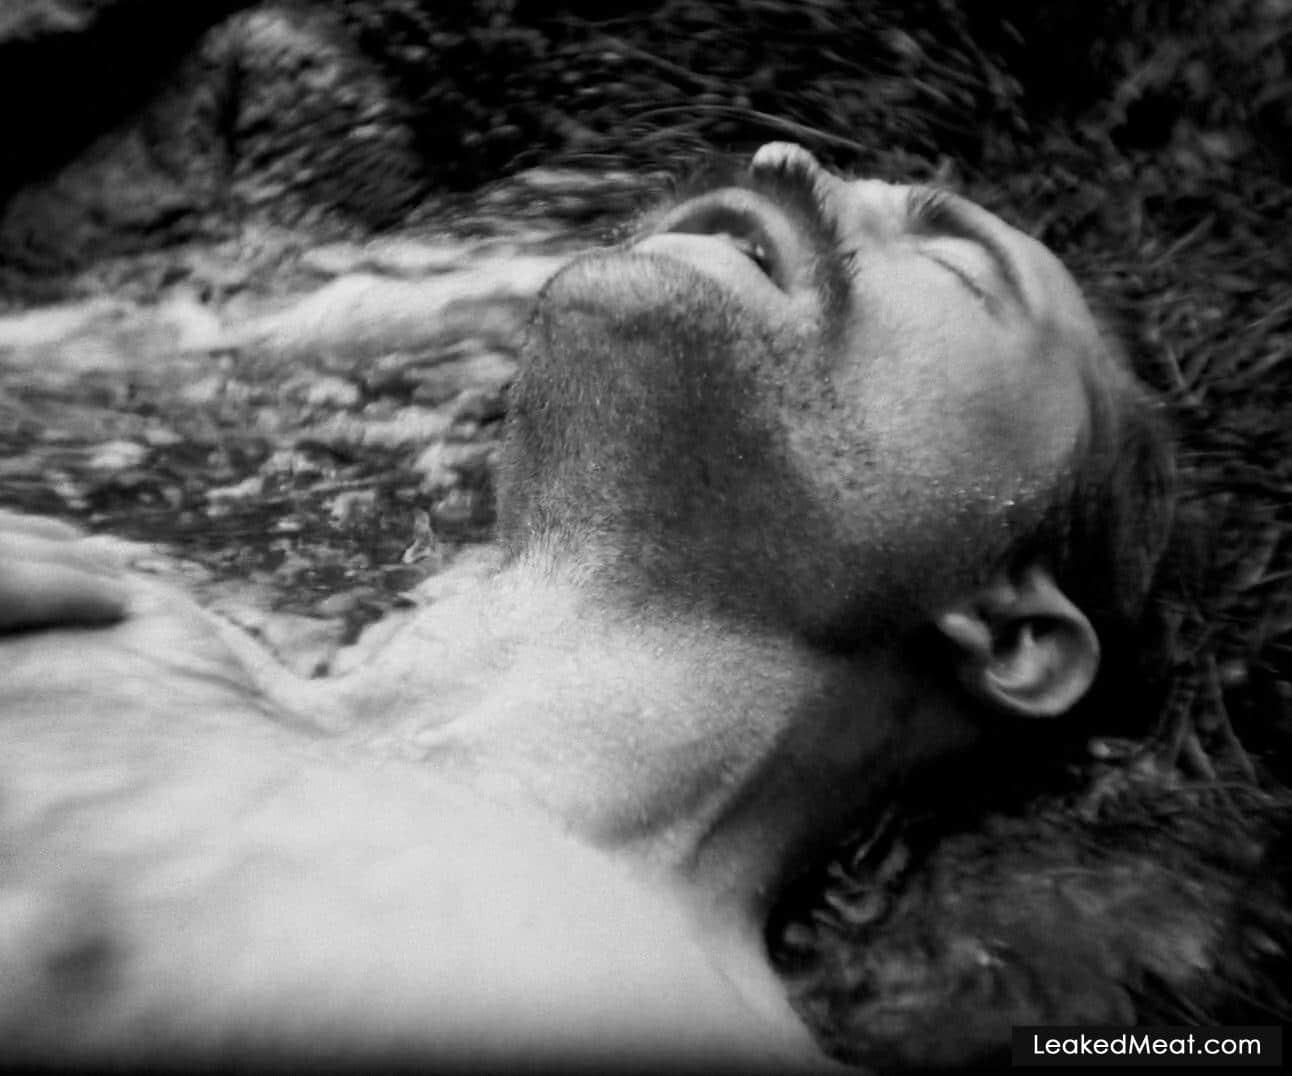 Robert Pattinson   LeakedMeat 6